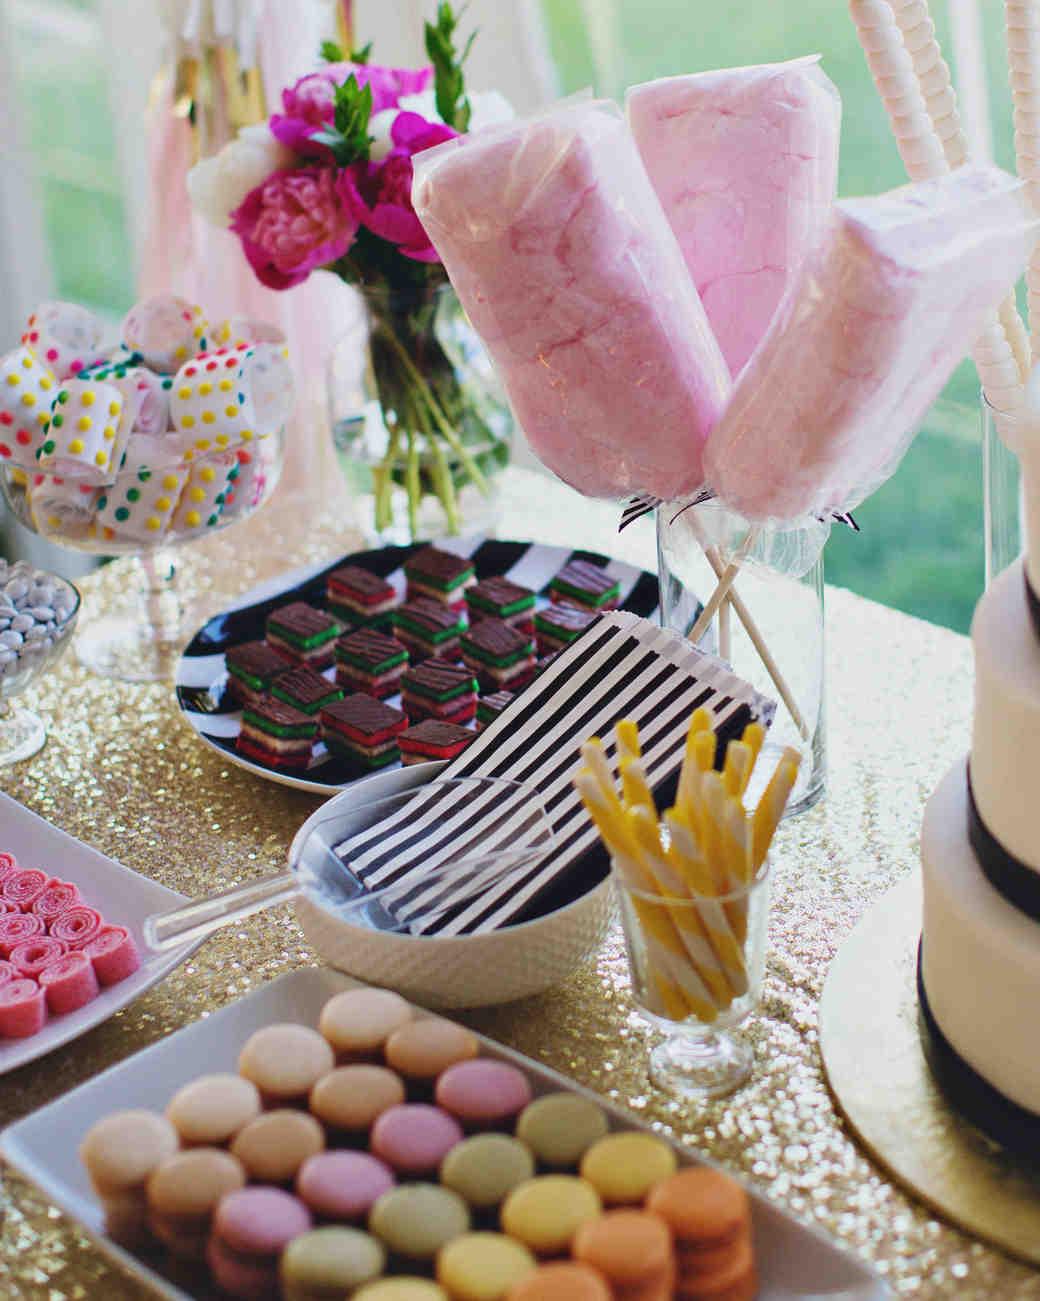 casey-ross-wedding-desserts-654-s111514-1114.jpg